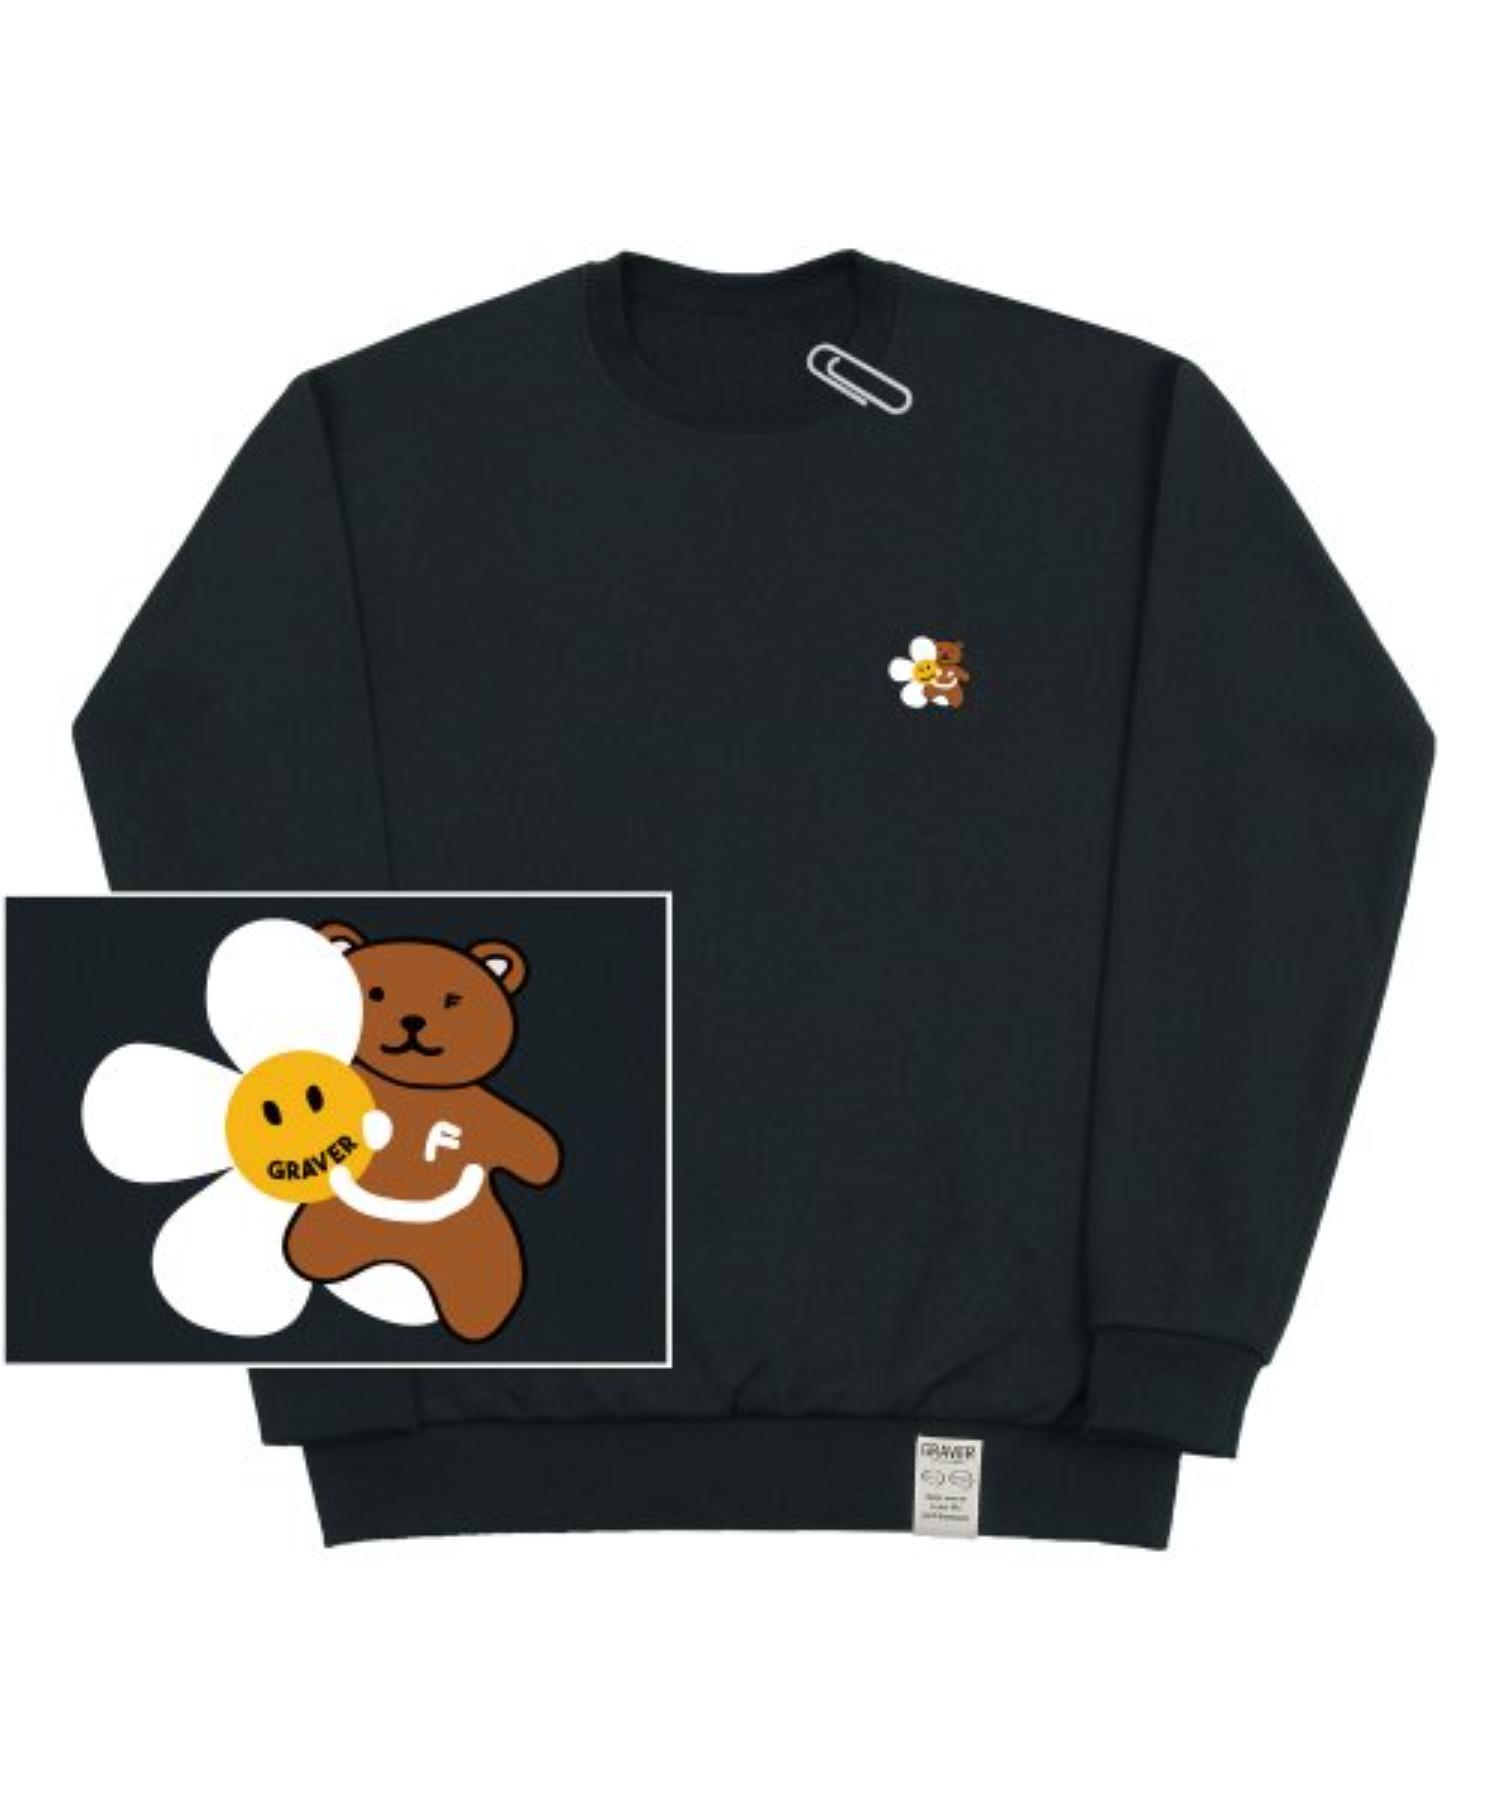 [UNISEX] Small Flower Bear Smile White Clip Sweatshirt_Charcoal